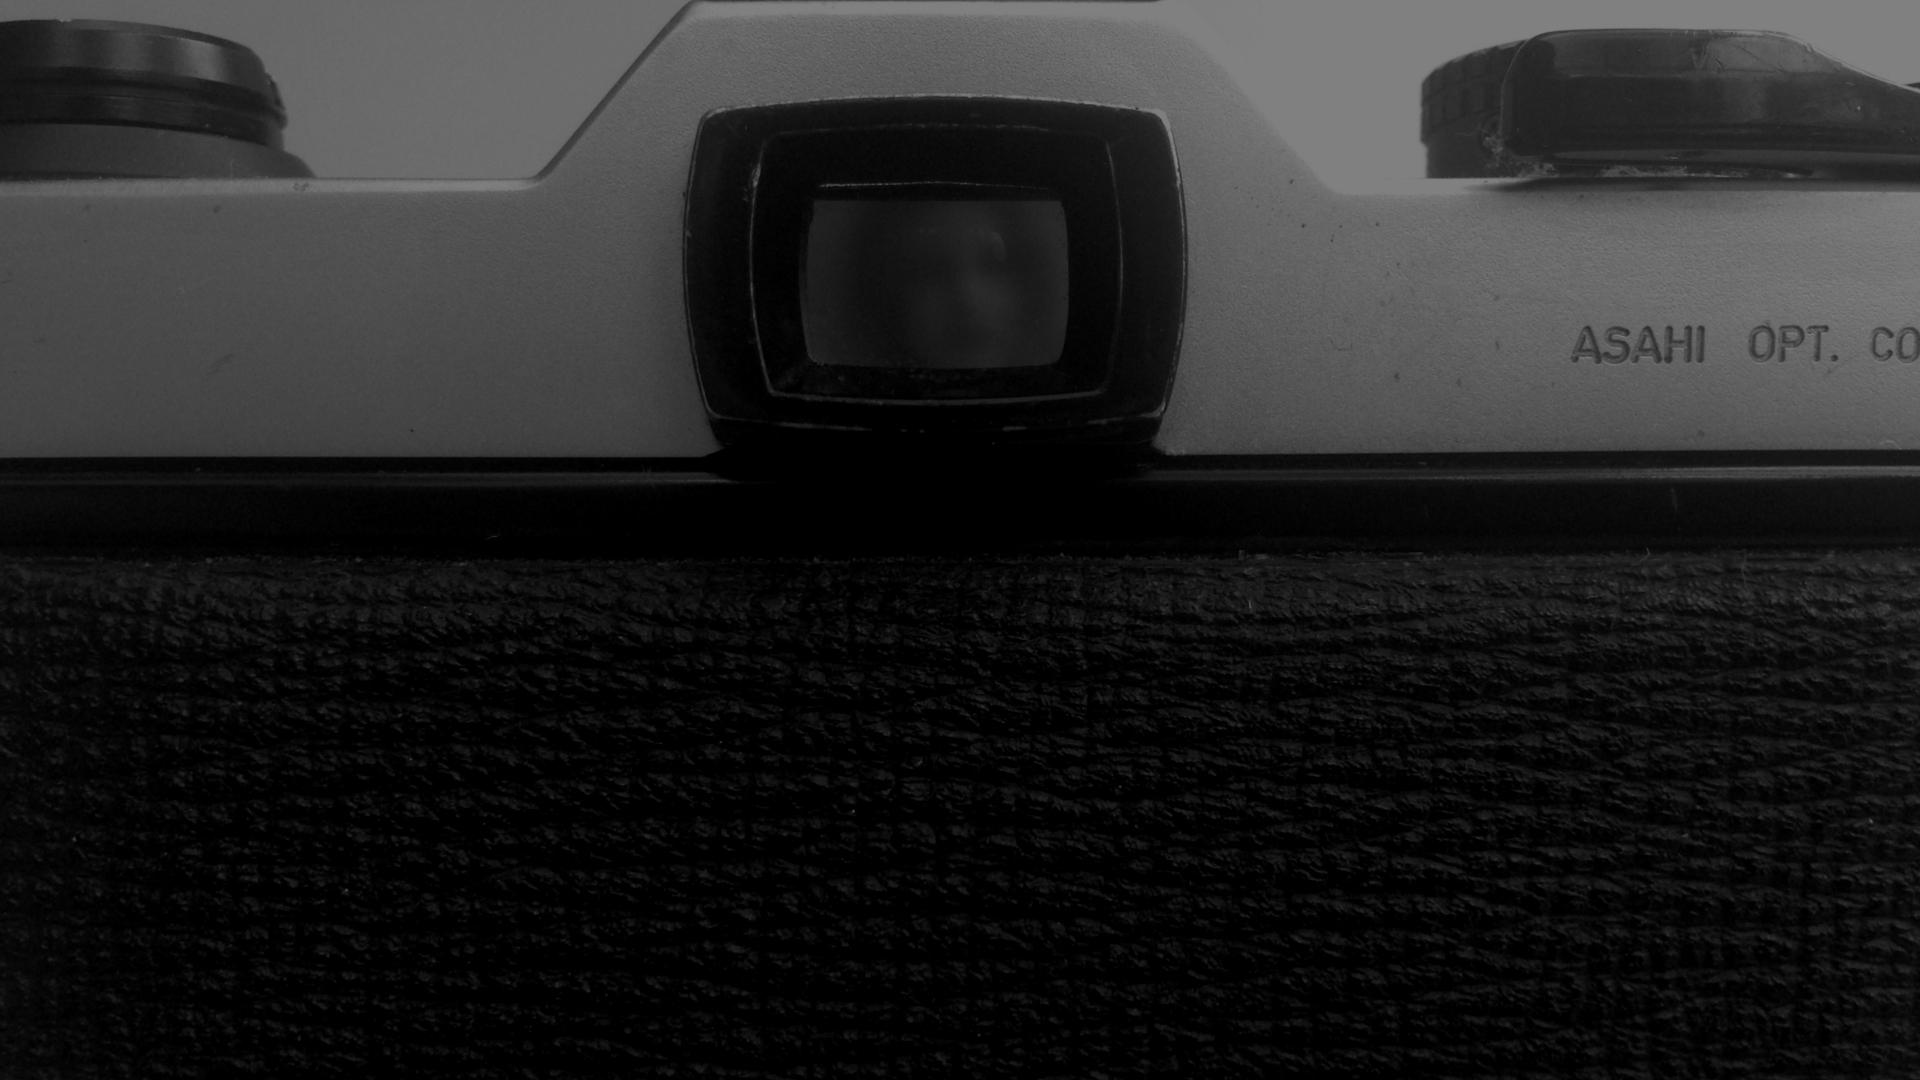 background-camera